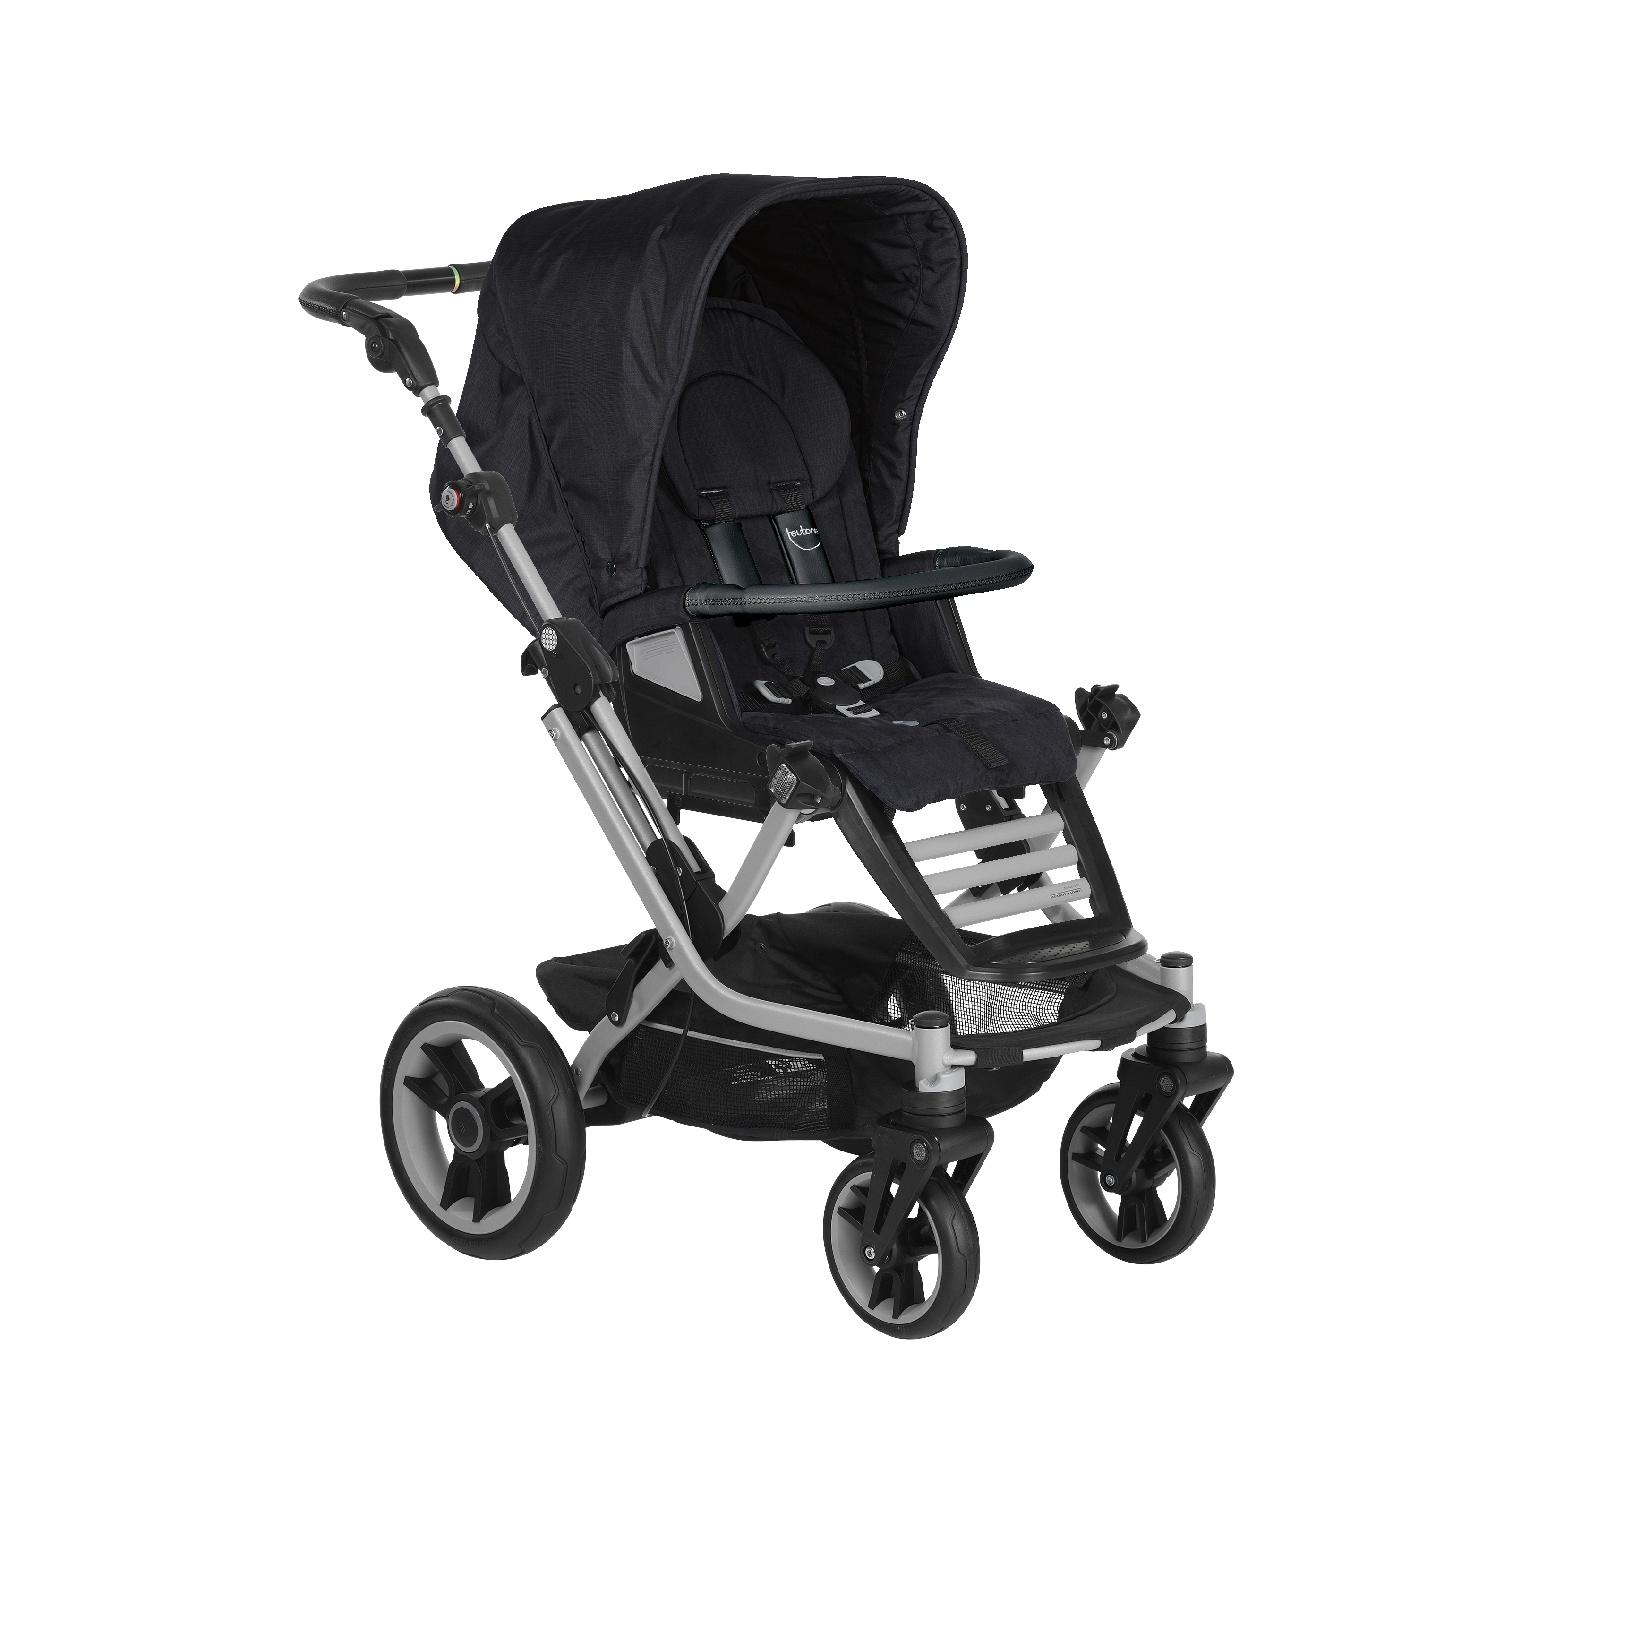 teutonia stroller mistral s 2016 6000 onyx buy at. Black Bedroom Furniture Sets. Home Design Ideas